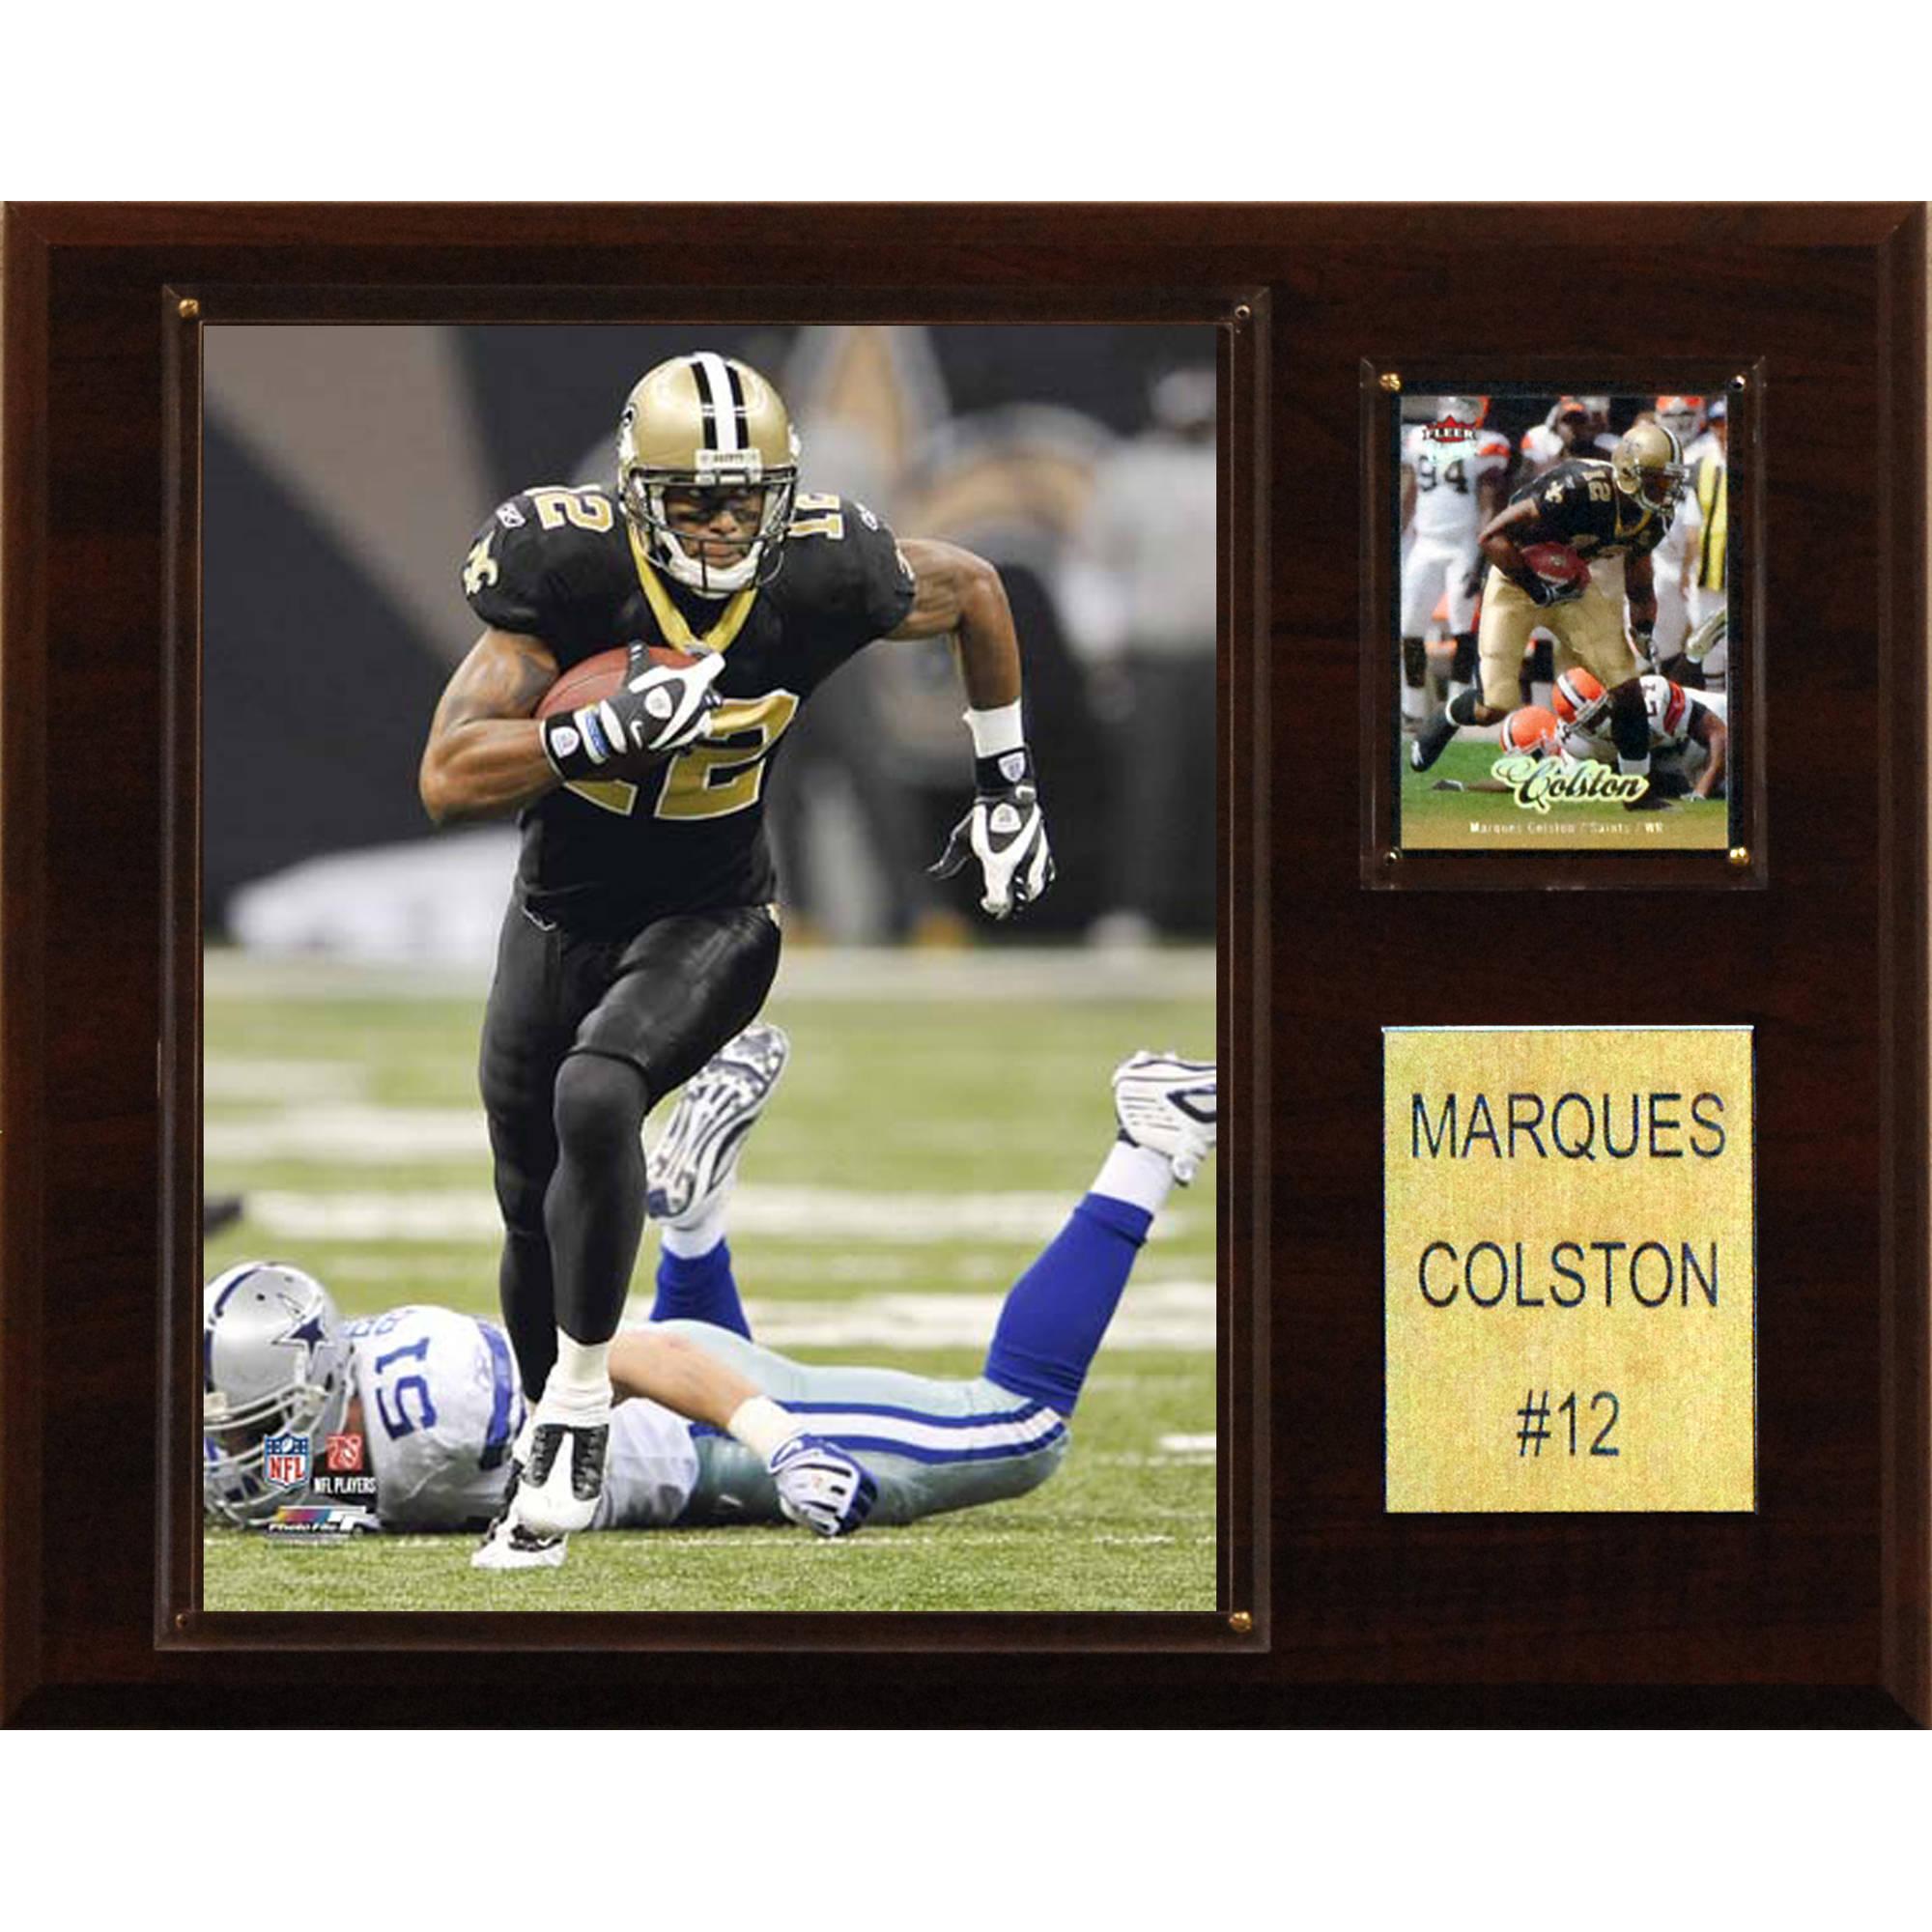 C&I Collectables NFL 12x15 Marques Colston New Orleans Saints Player Plaque